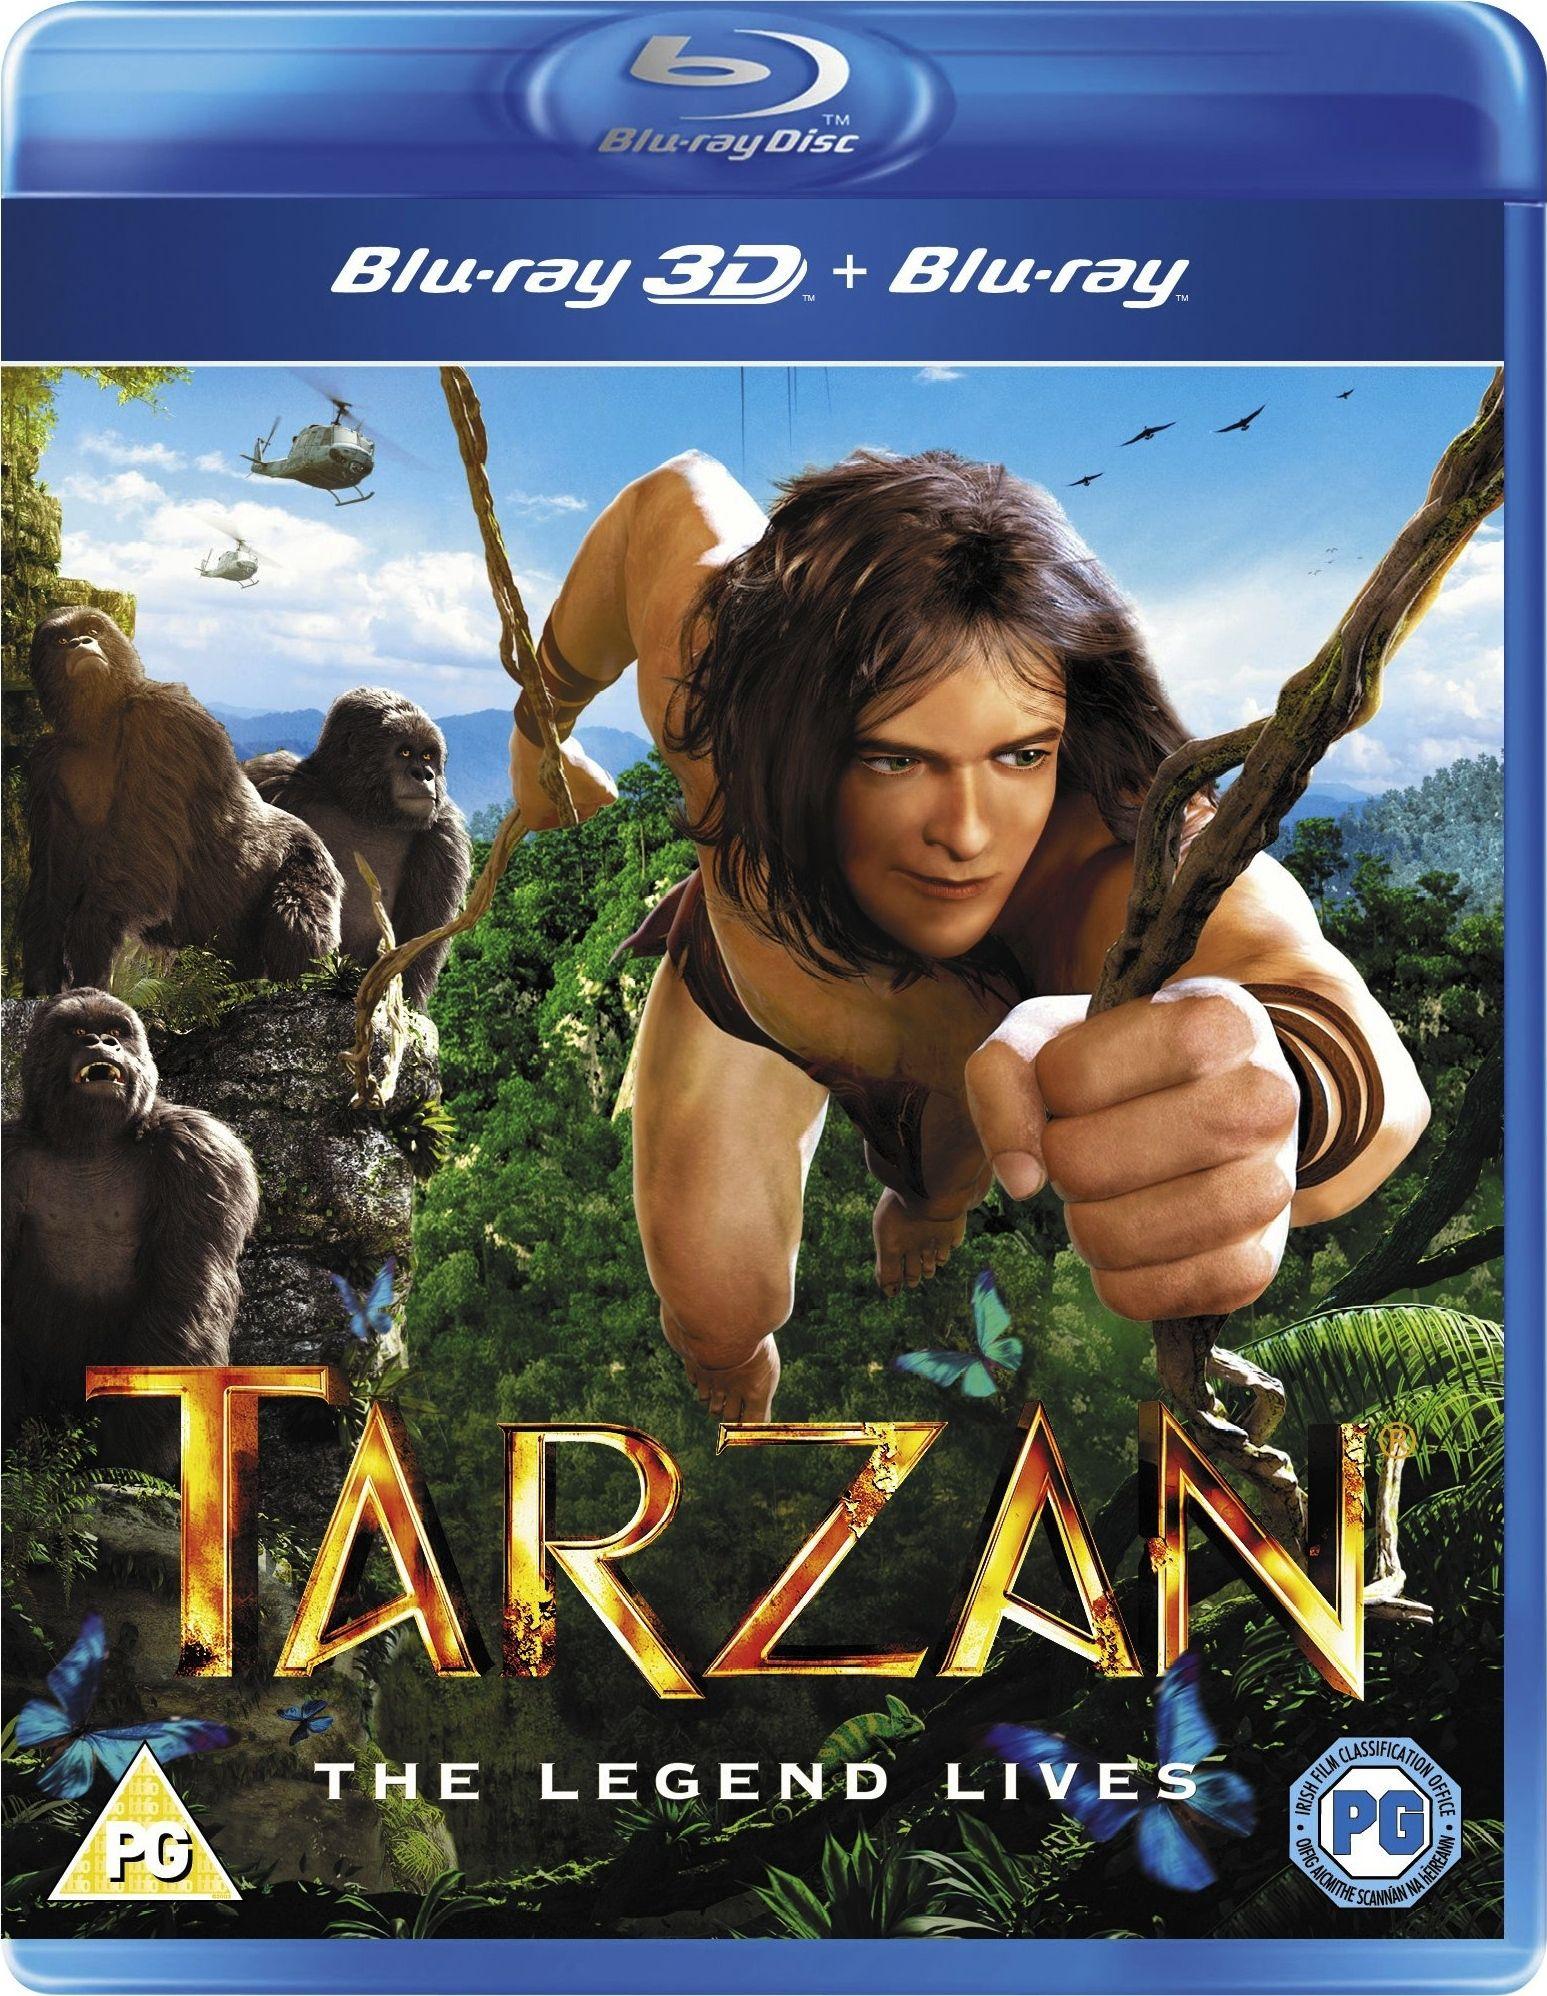 Tarzan 2014 full movie download free / Human weapon season 1 episode 1